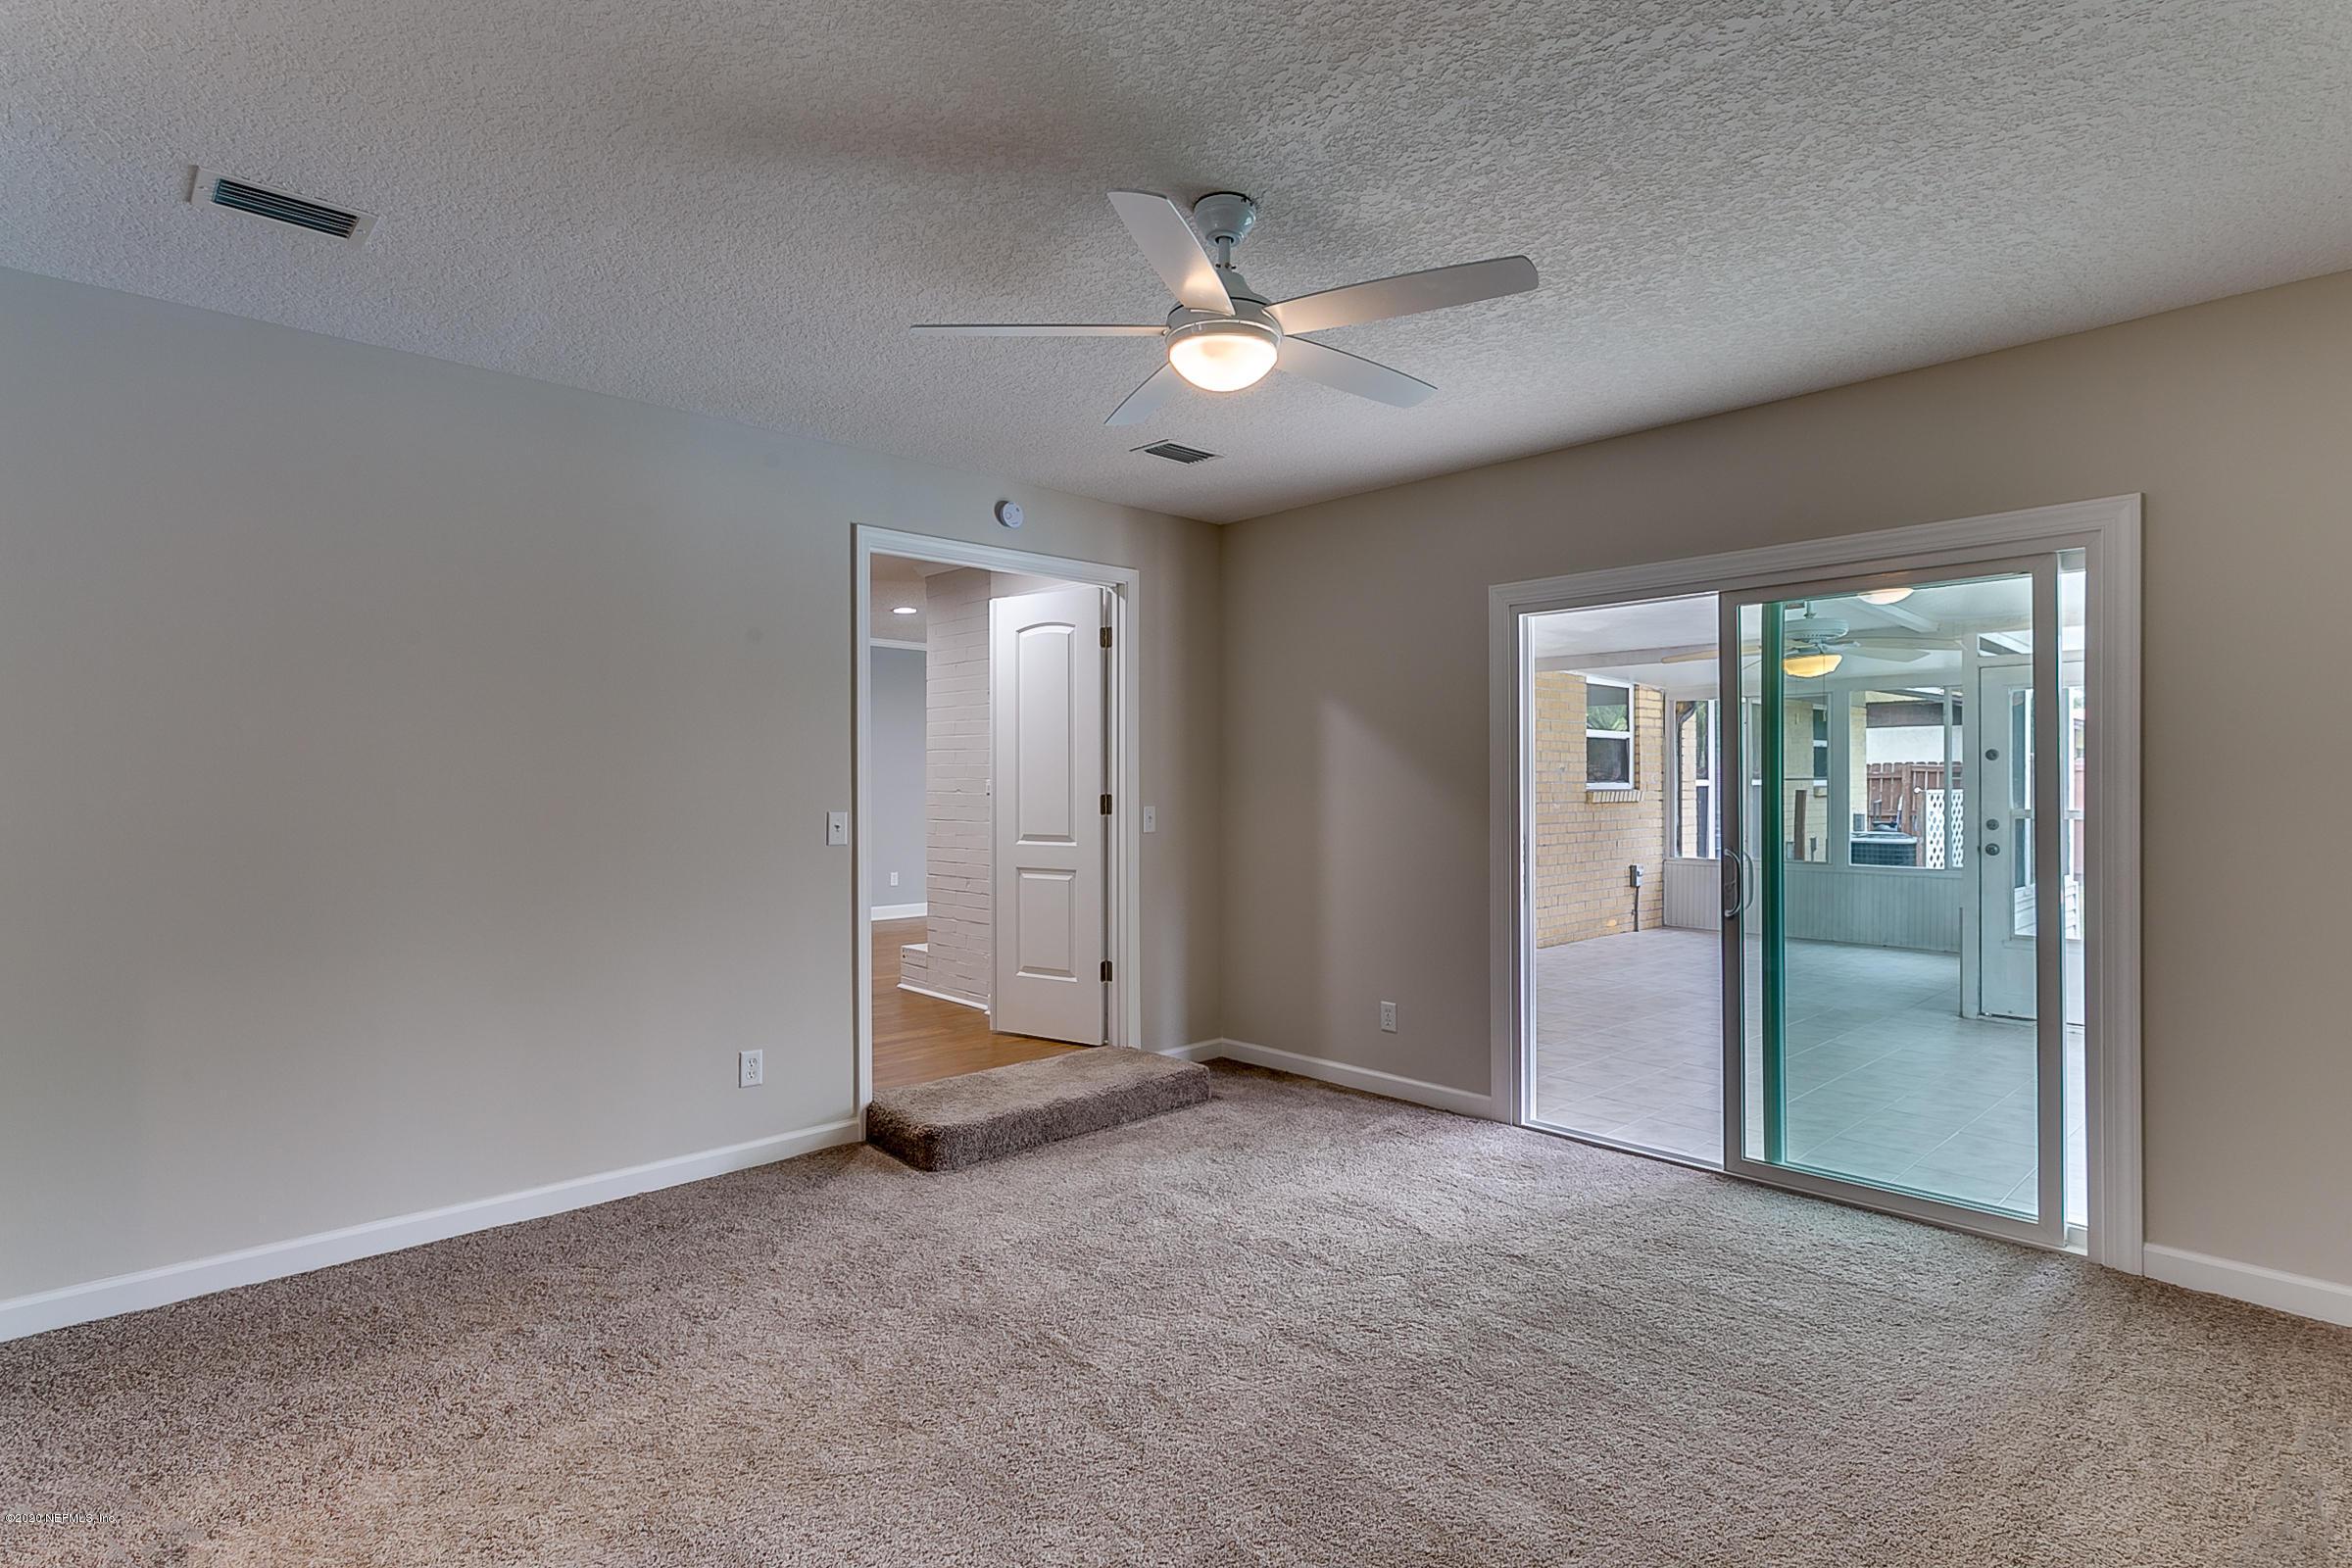 5456 JACKSON, ORANGE PARK, FLORIDA 32073, 3 Bedrooms Bedrooms, ,2 BathroomsBathrooms,Residential,For sale,JACKSON,1054436